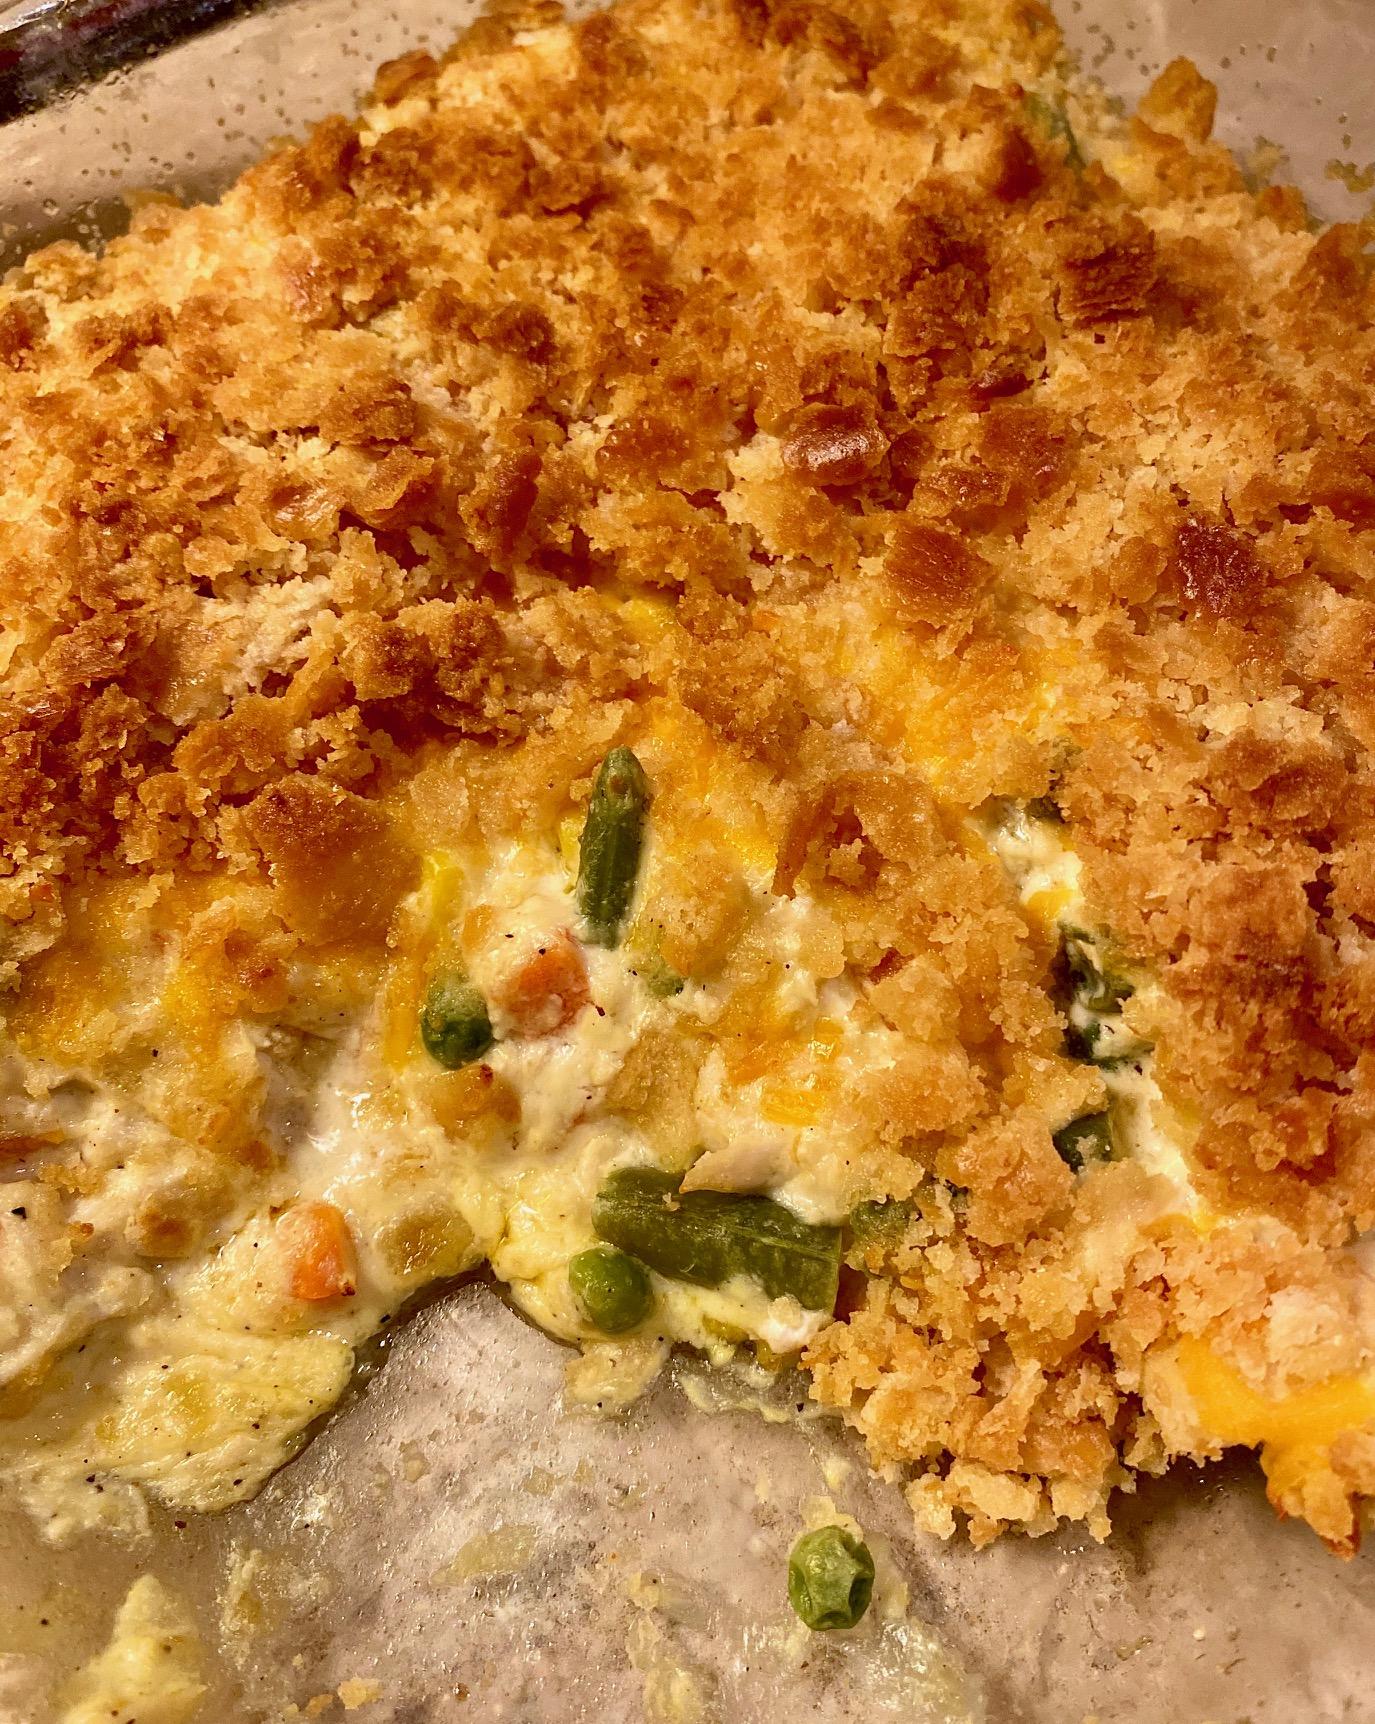 Lower-Calorie Creamy Chicken Casserole